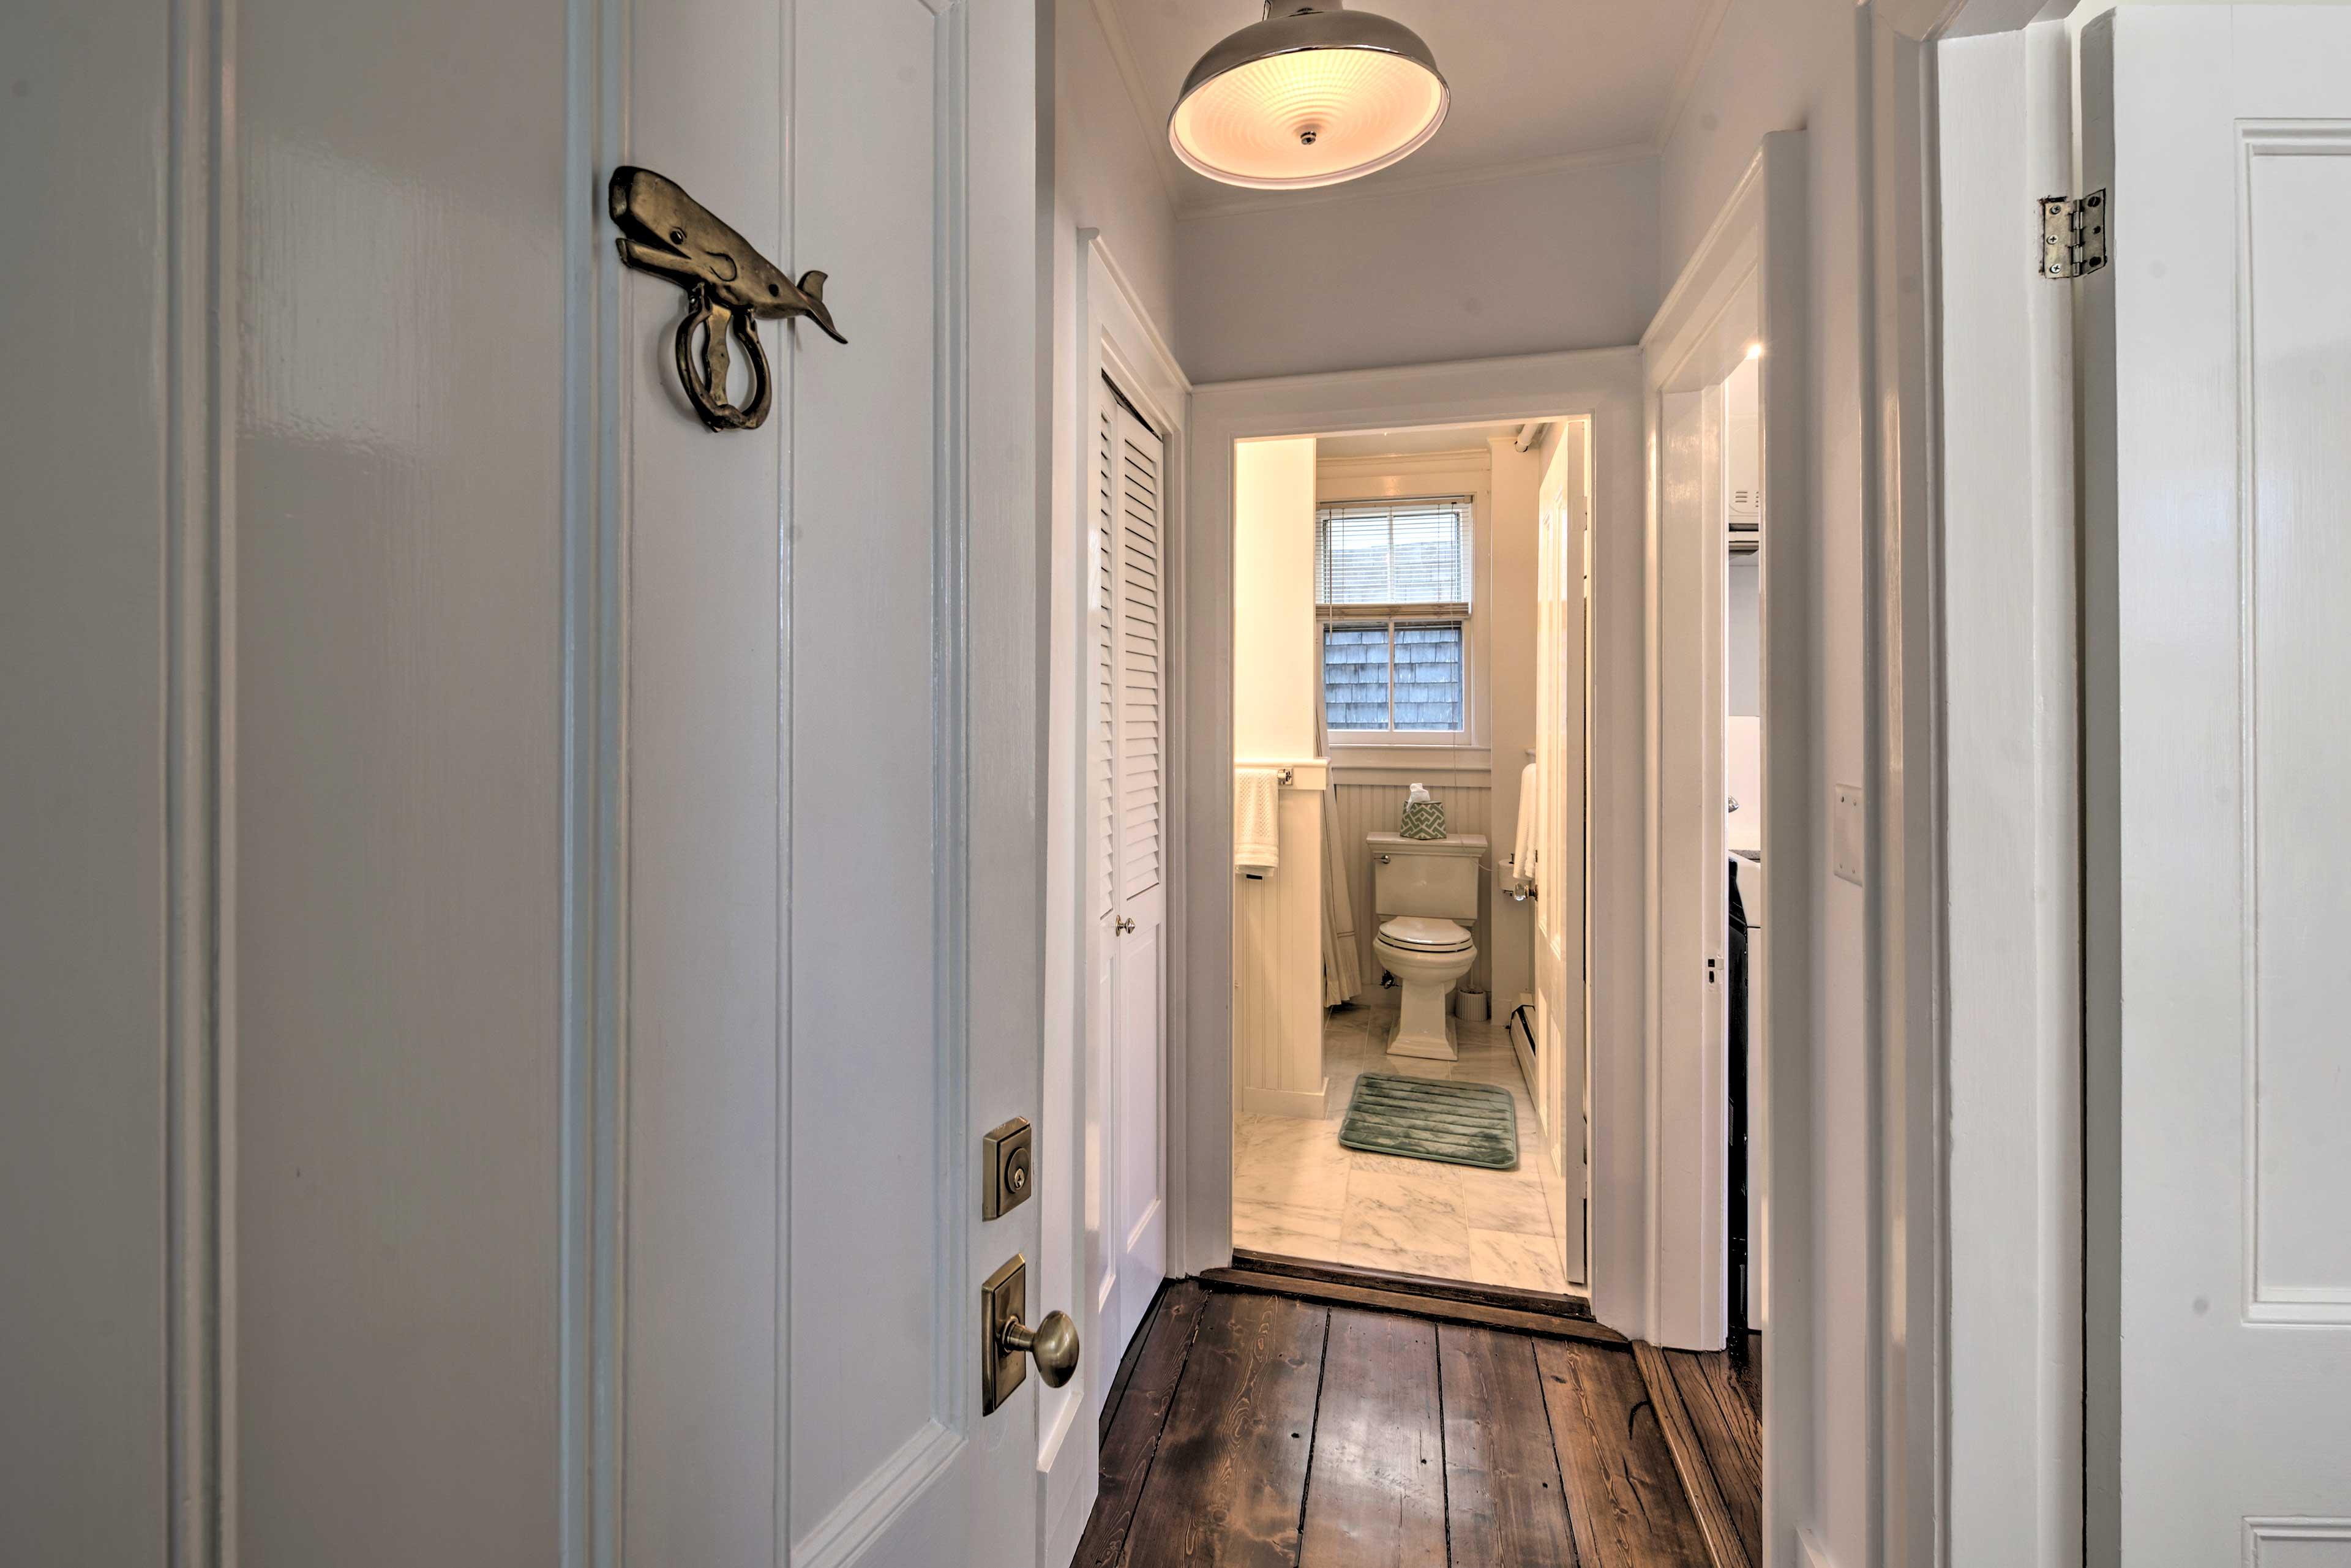 Admire the unique whale knocker no the door as you walk through it.